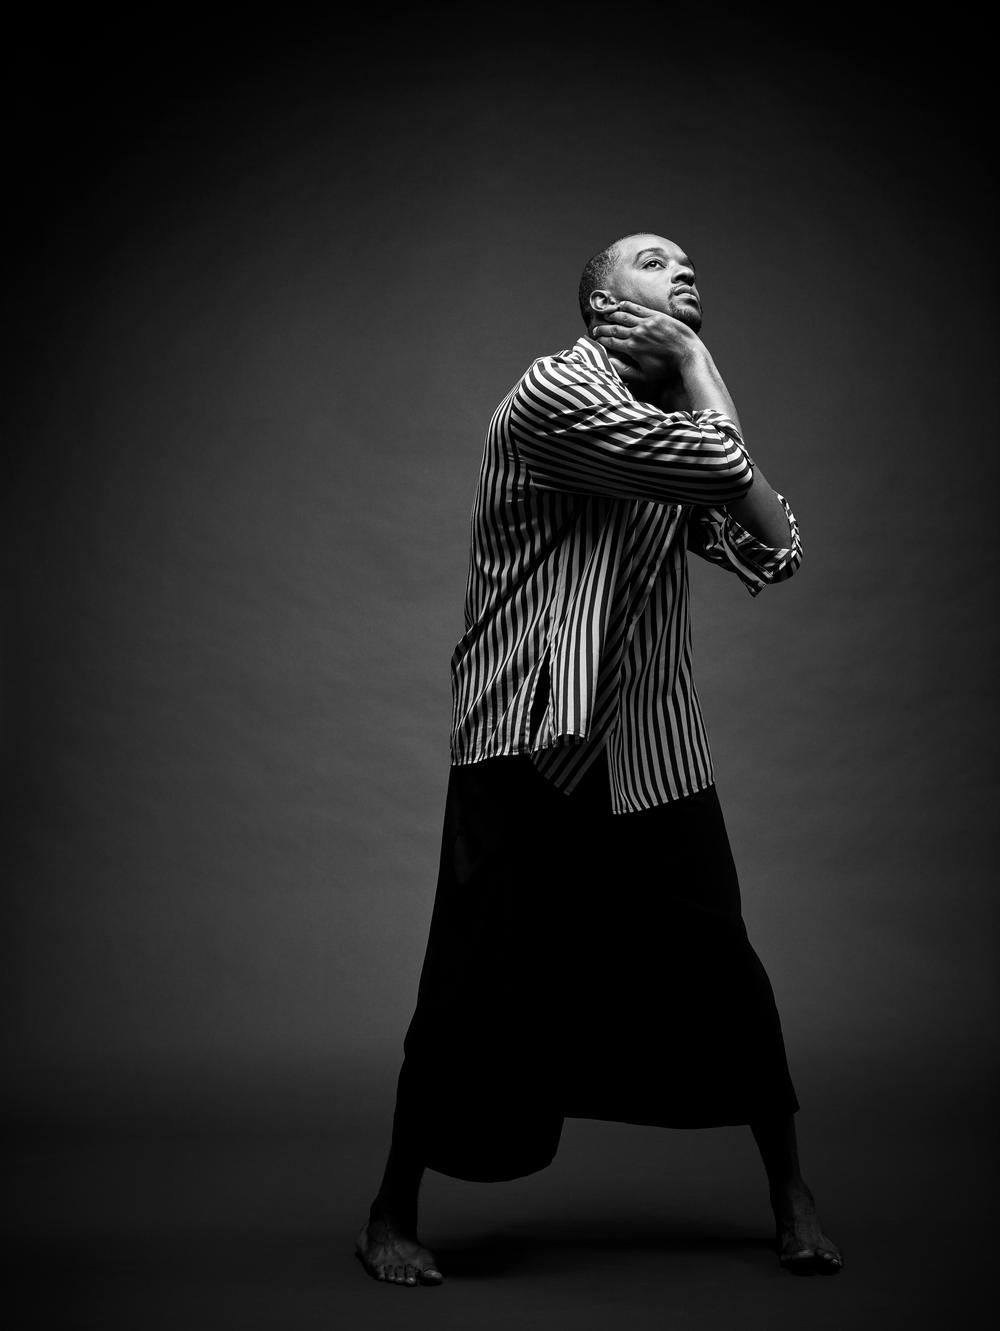 03_Jamal-Dark-Blue-Background-Stripe-Shirt-Black-Pants_0240 1.png